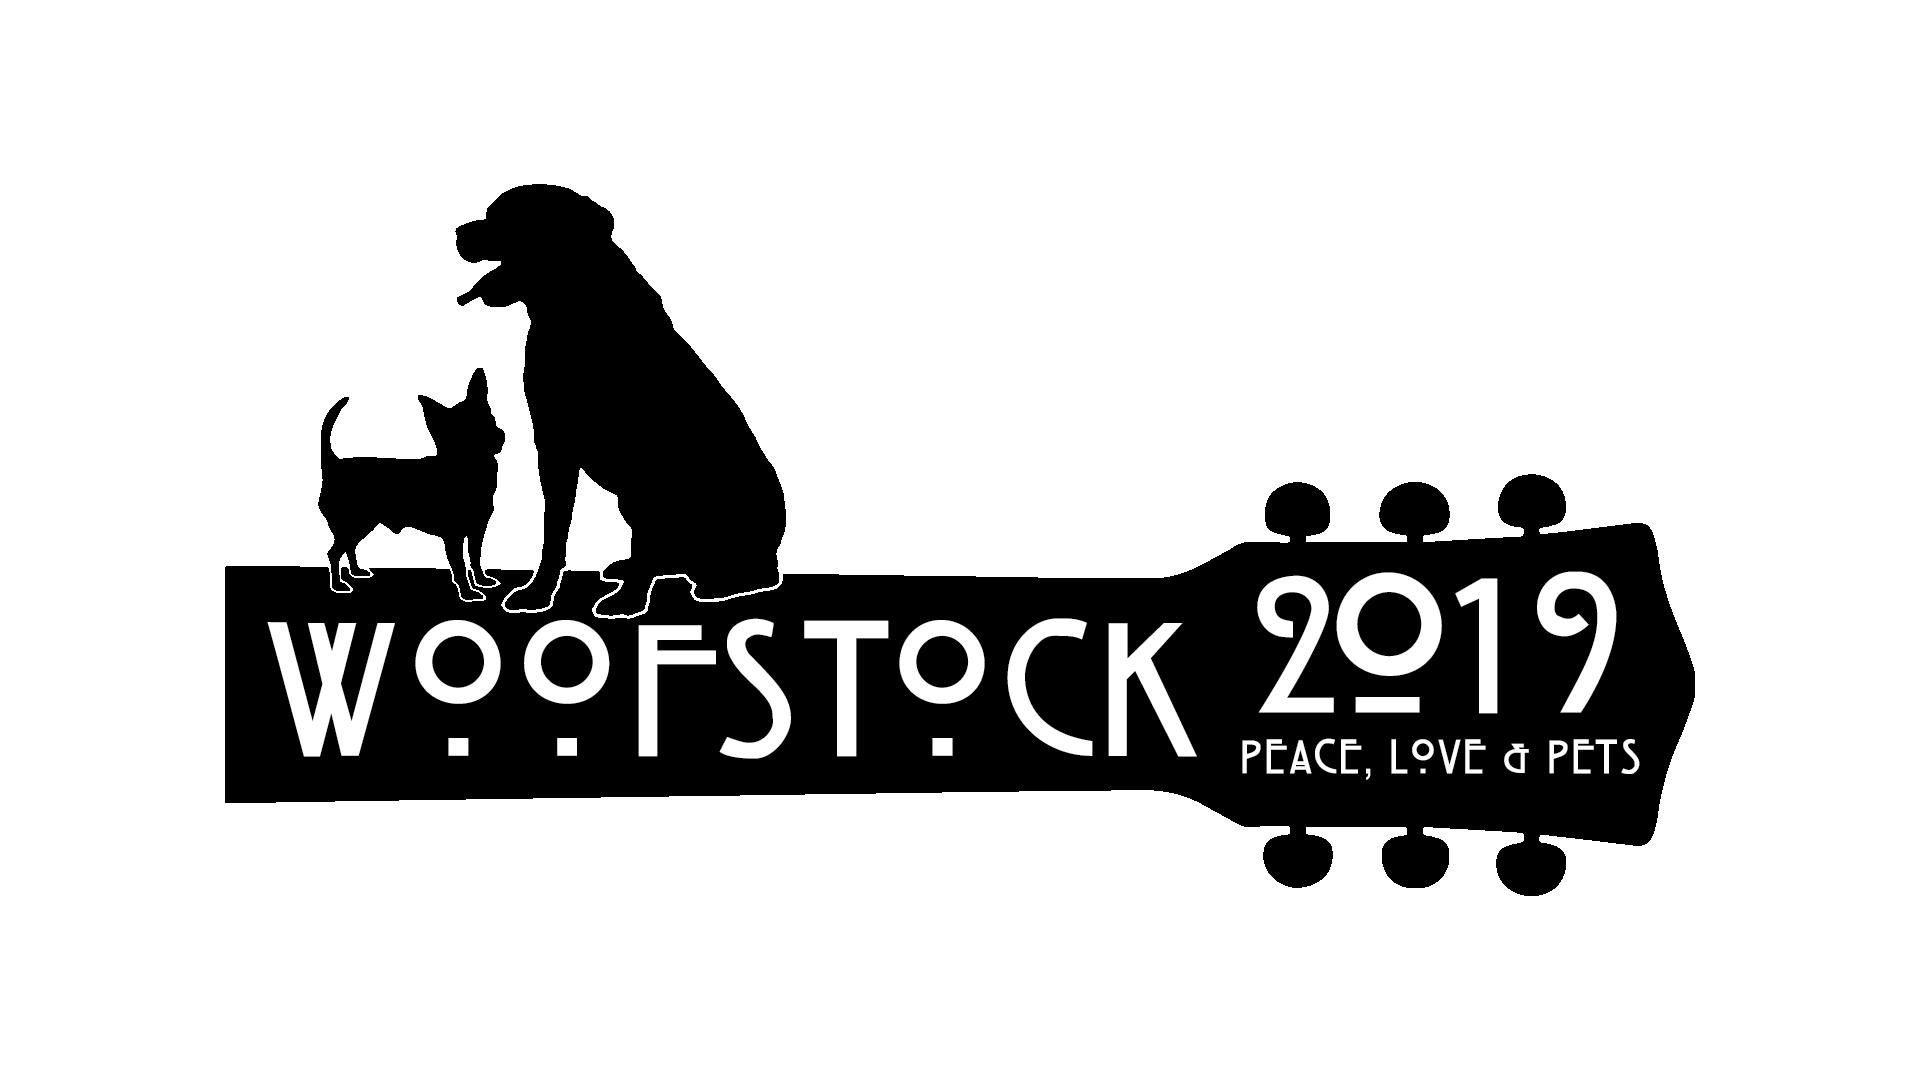 Woofstock2019